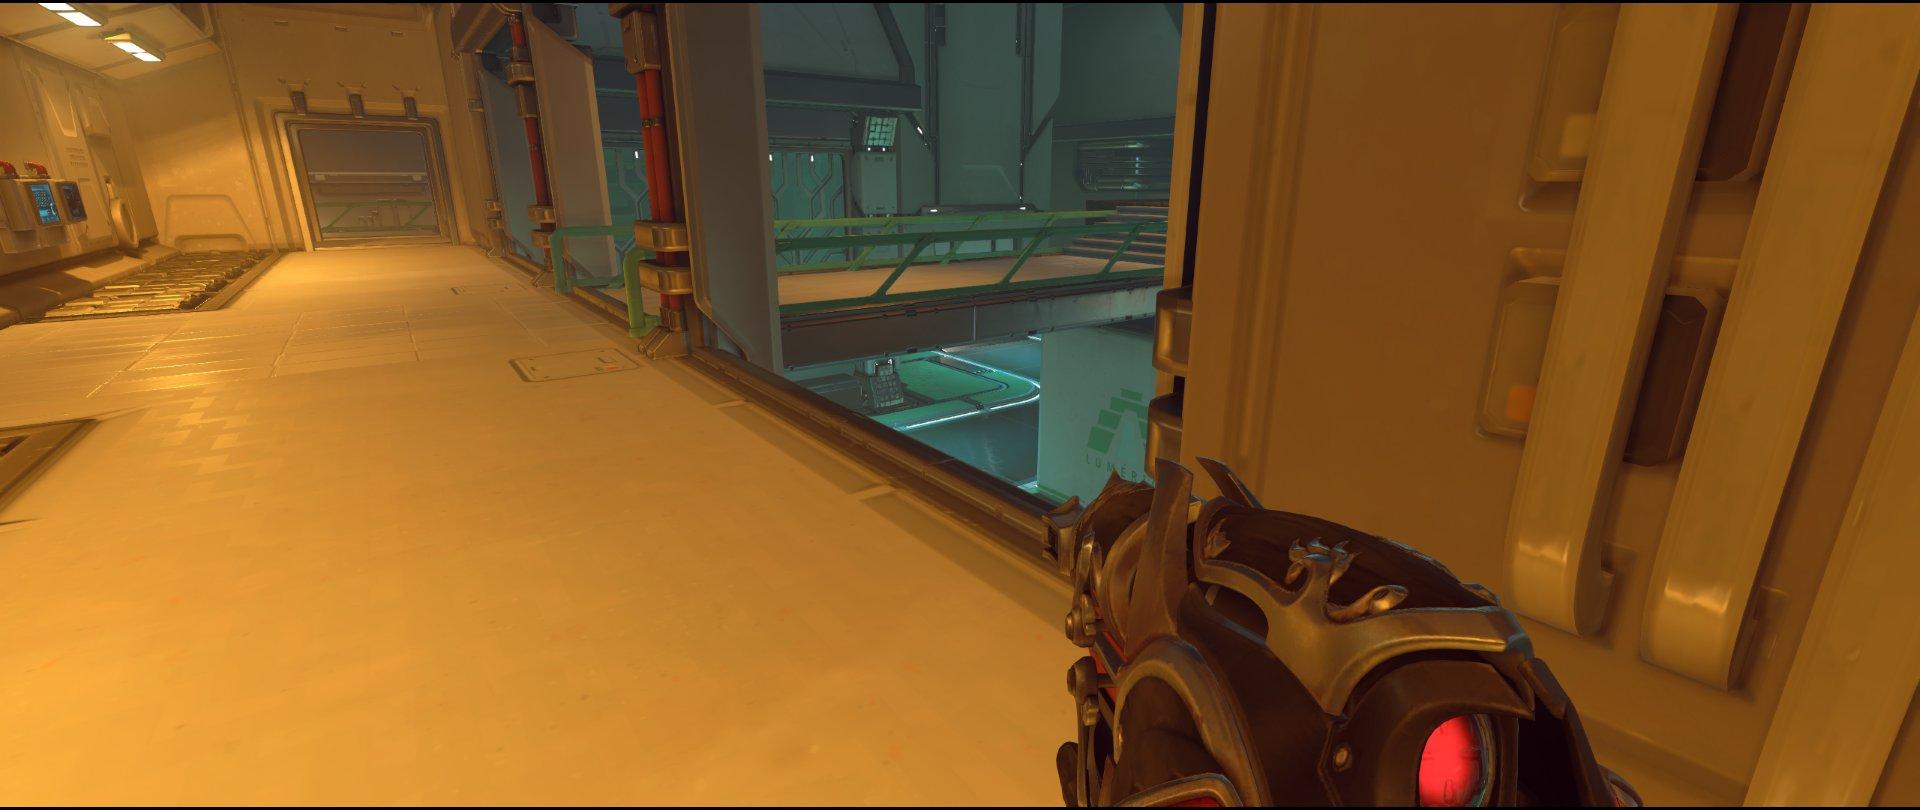 Halls high ground defense sniping spot Widowmaker Dorado.jpg